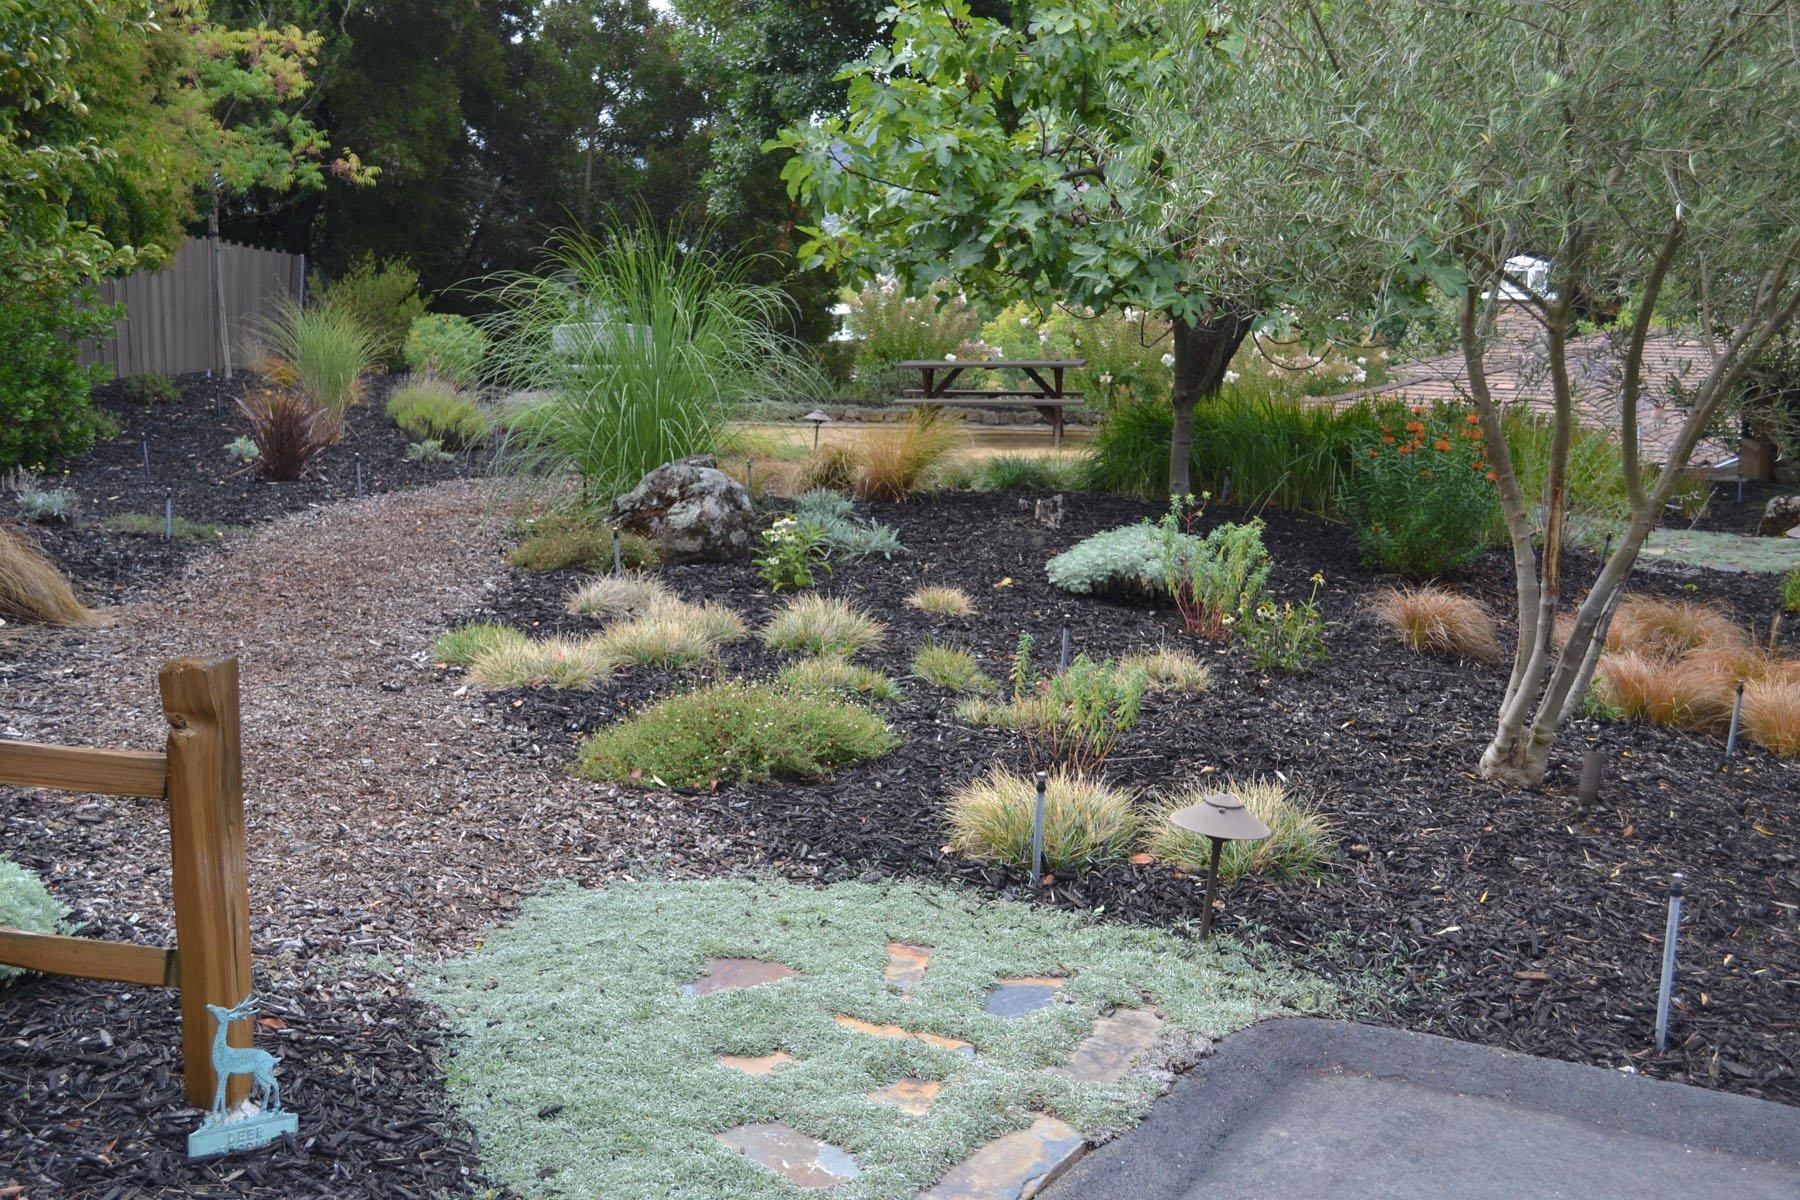 Drought Resistant Landscaping in Alamo CA - Quality Gardening \u0026 Landscaping & Drought Resistant Landscaping in Benicia Danville Alamo Orinda ...